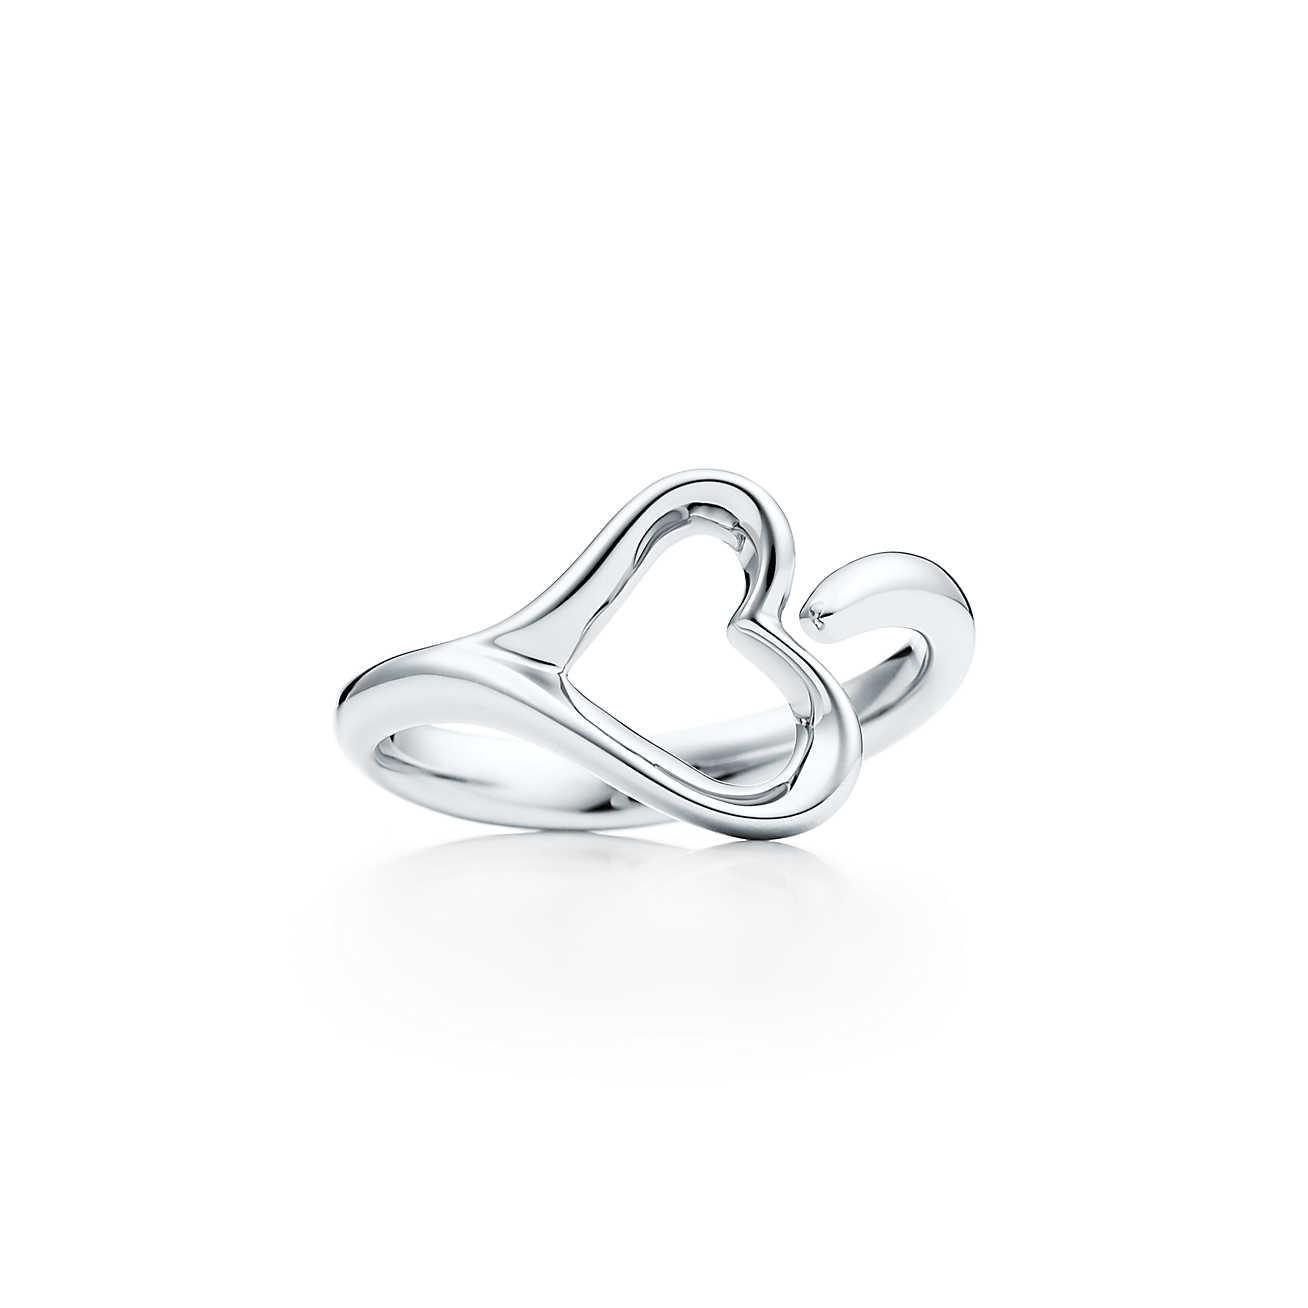 1308x1308 Elsa Open Heart Ring In Sterling Silver, Small. Tiffany